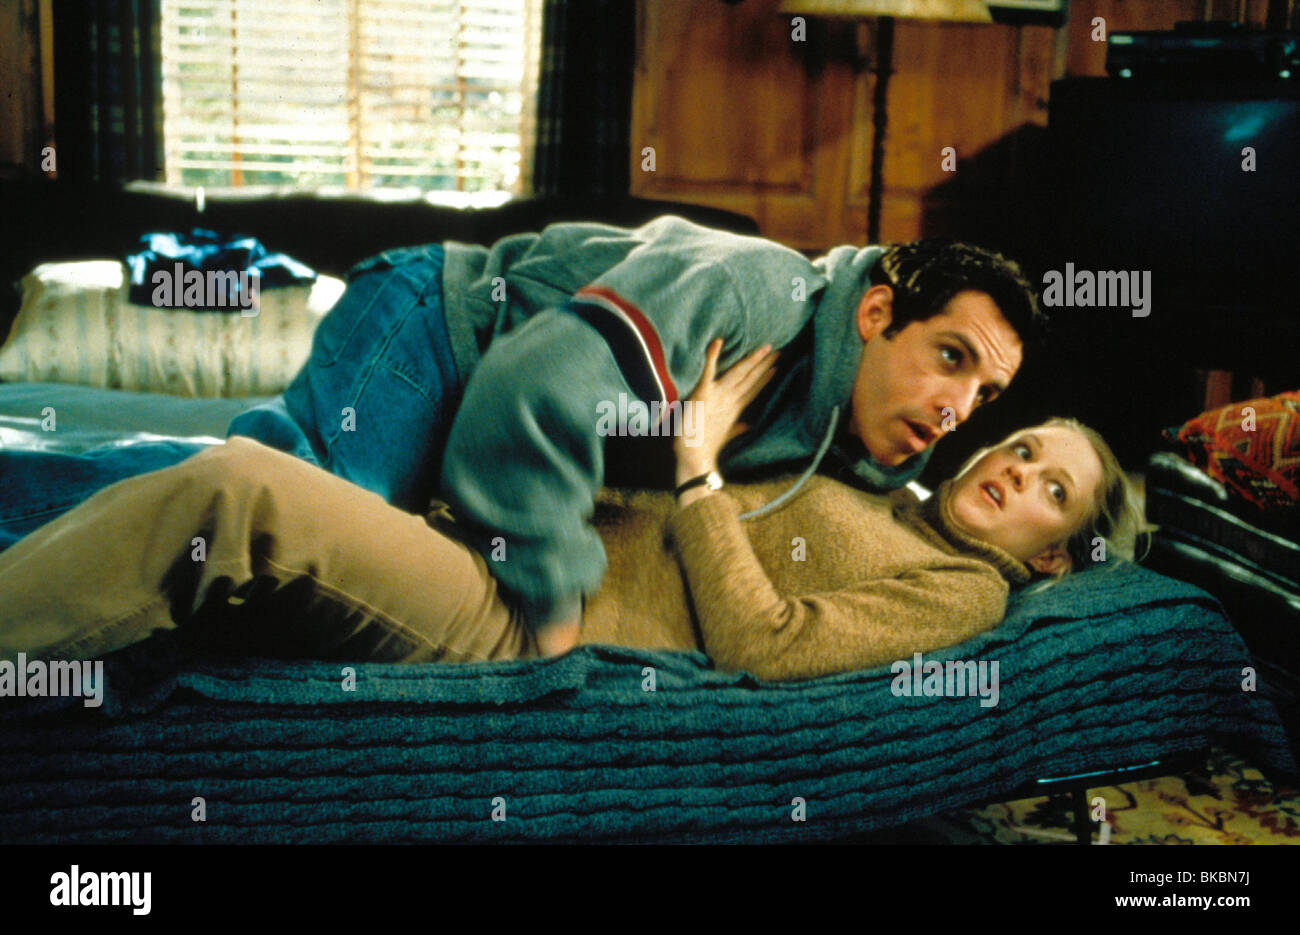 MEET THE PARENTS (2000) BEN STILLER, TERI POLO MEET 083 - Stock Image